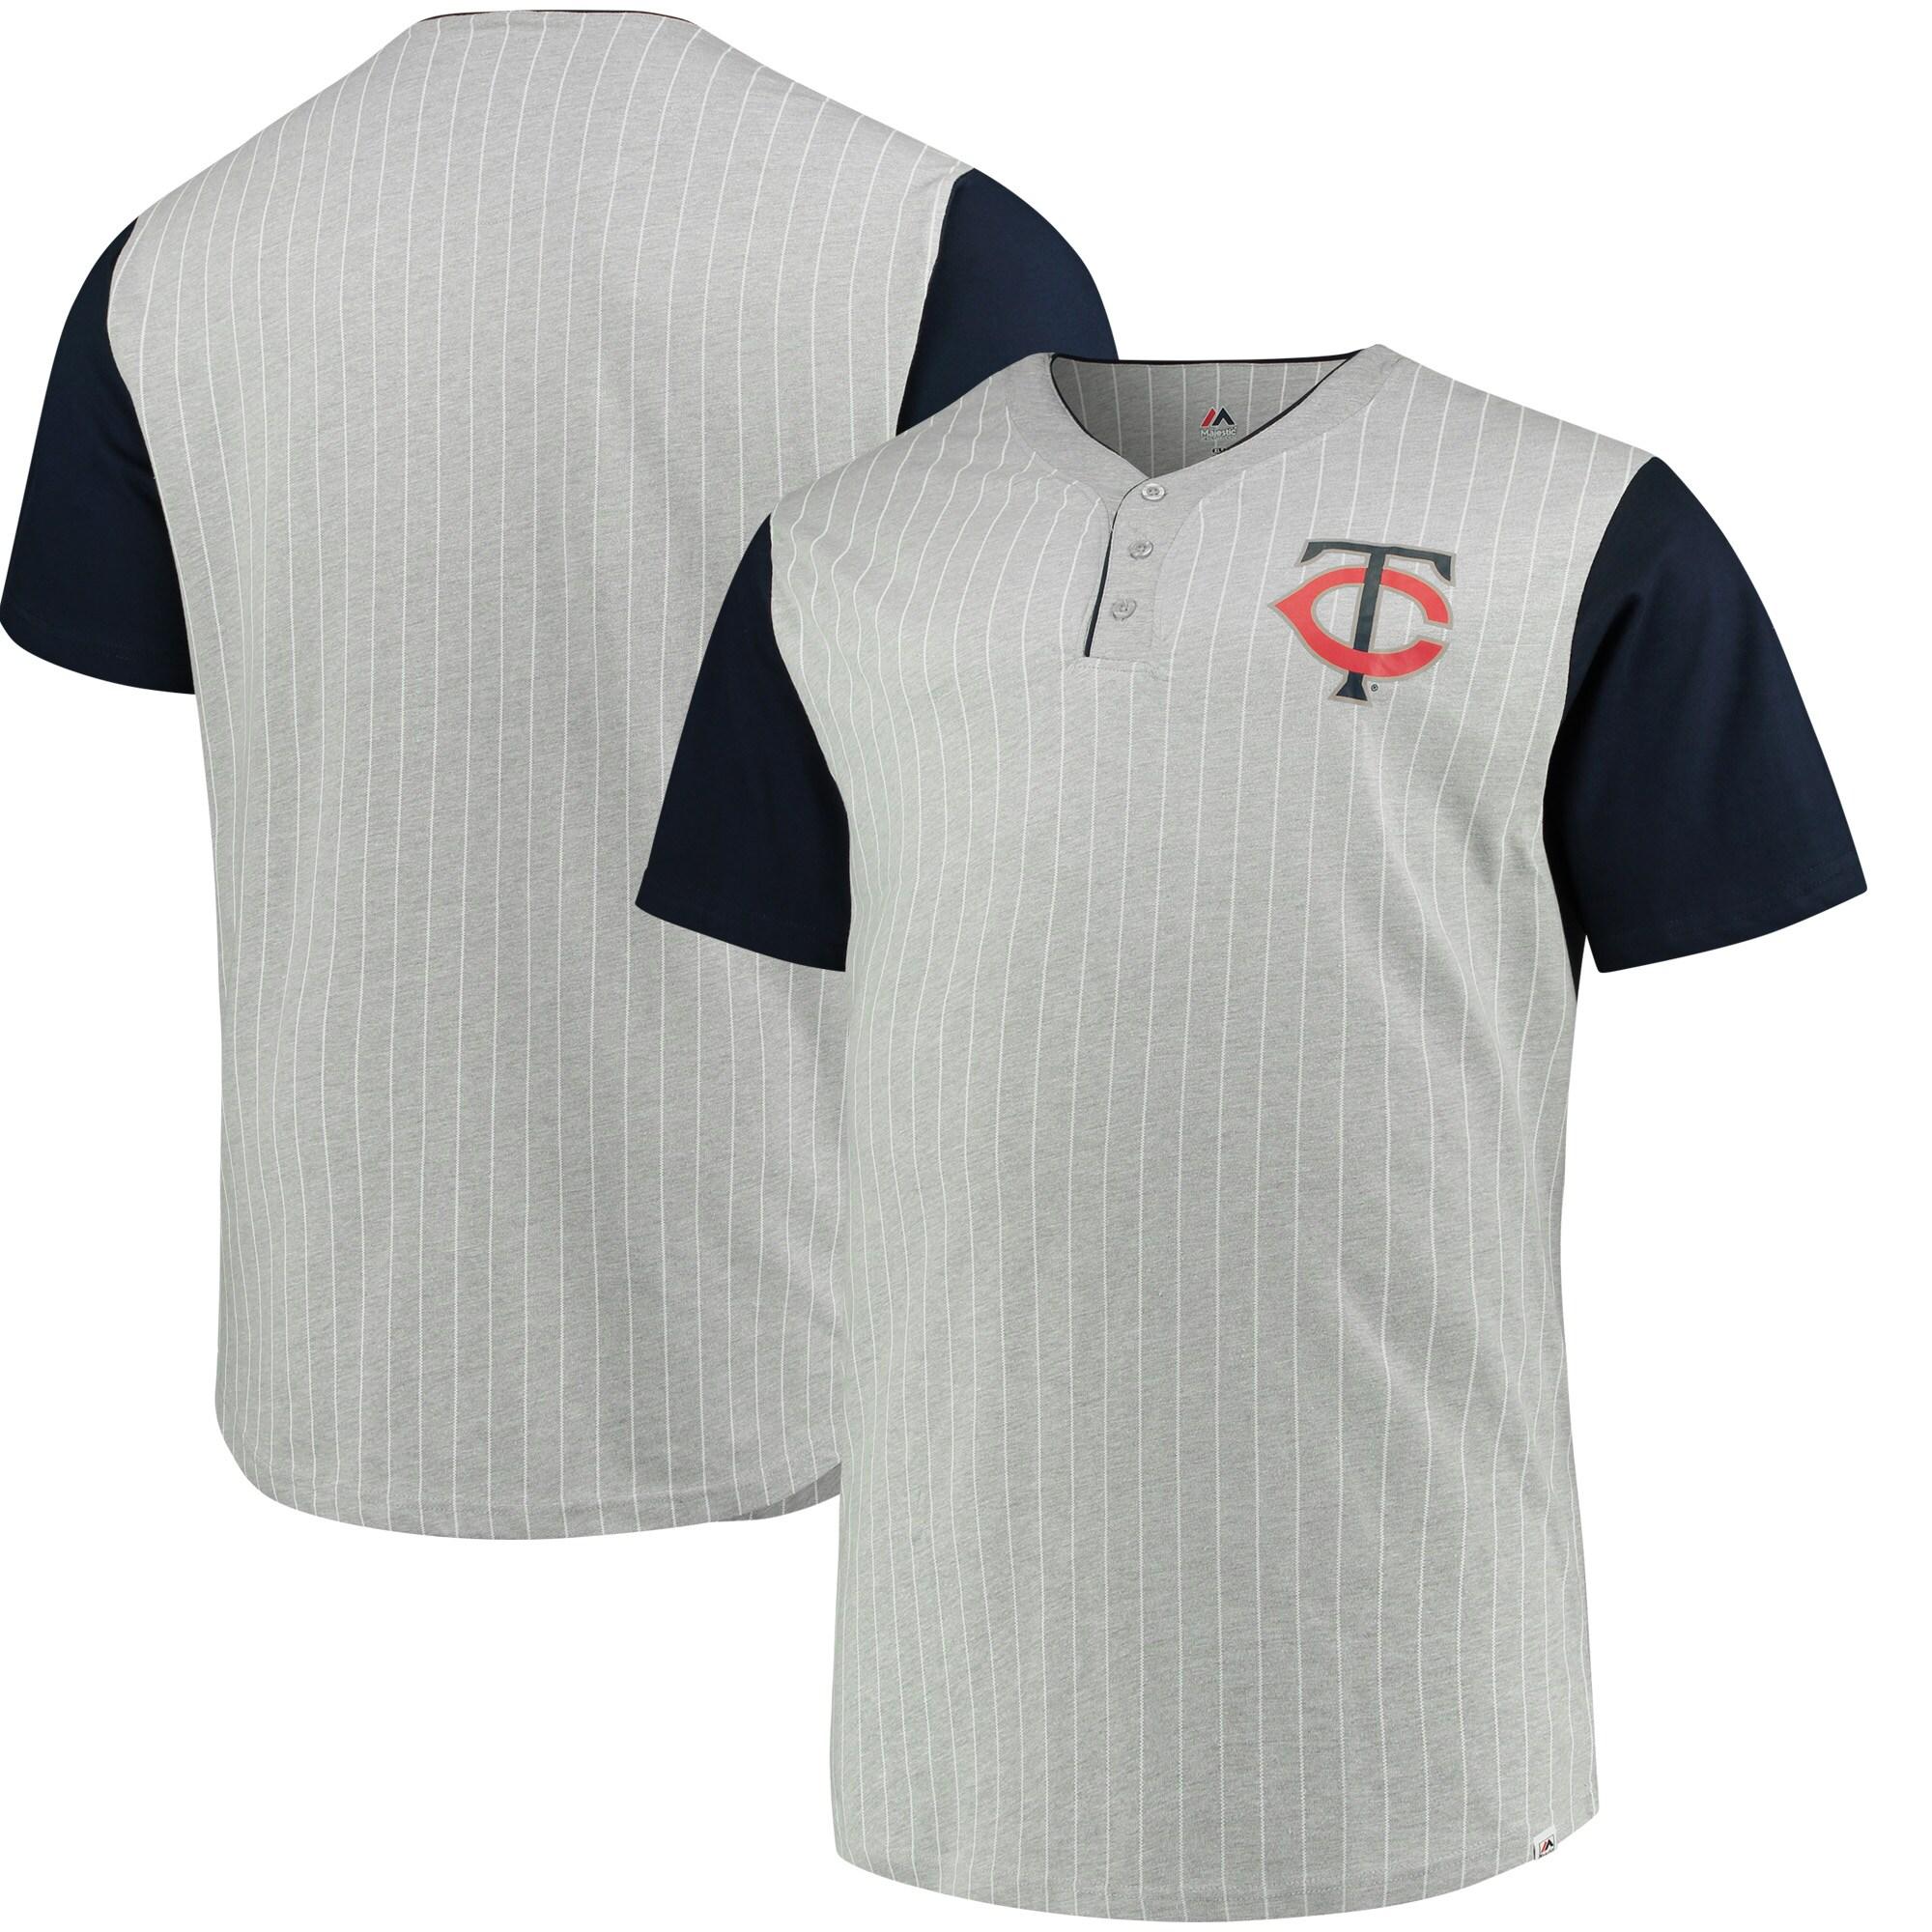 Minnesota Twins Majestic Big & Tall Life or Death Pinstripe Henley T-Shirt - Gray/Navy